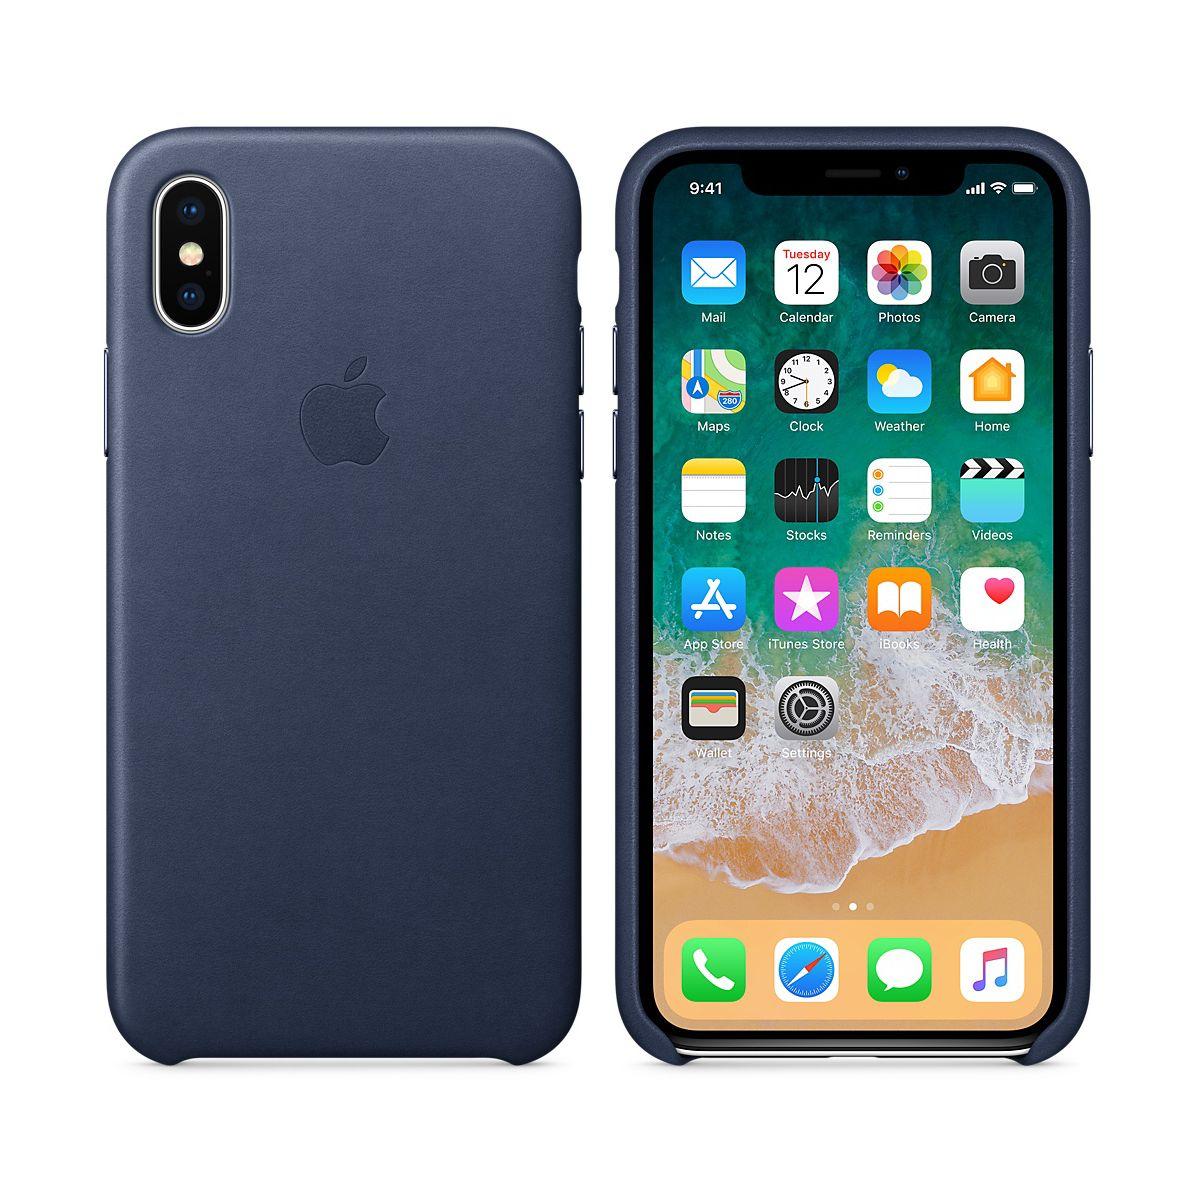 Coque APPLE iPhone X cuir bleu nuit (photo)